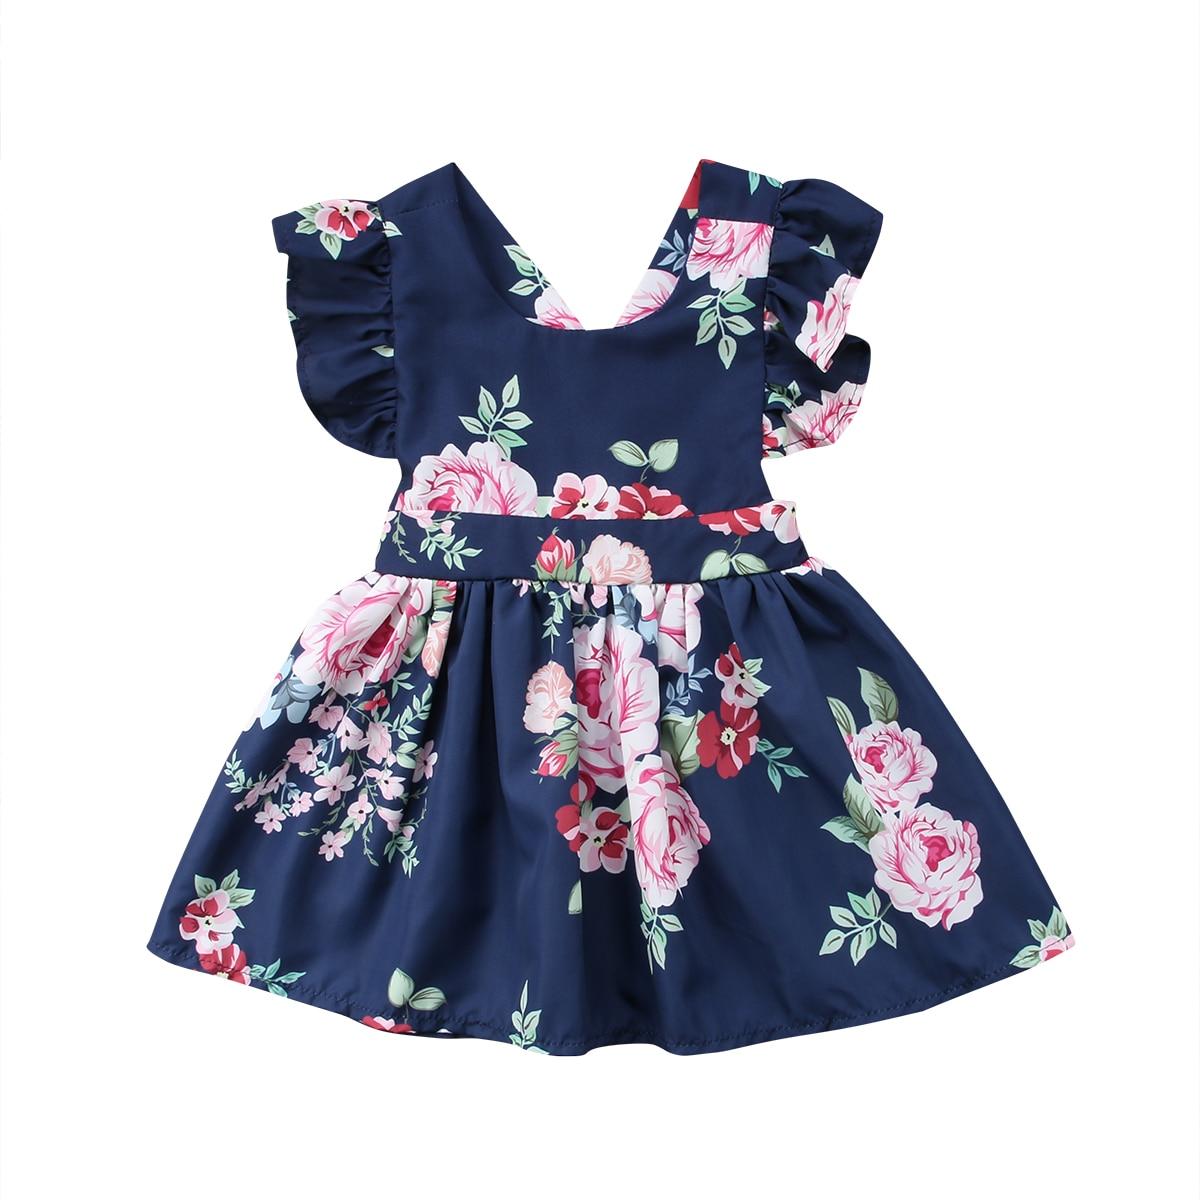 USA Toddler Kids Baby Girls Flower Summer Party Backless Dress Sundress Clothes